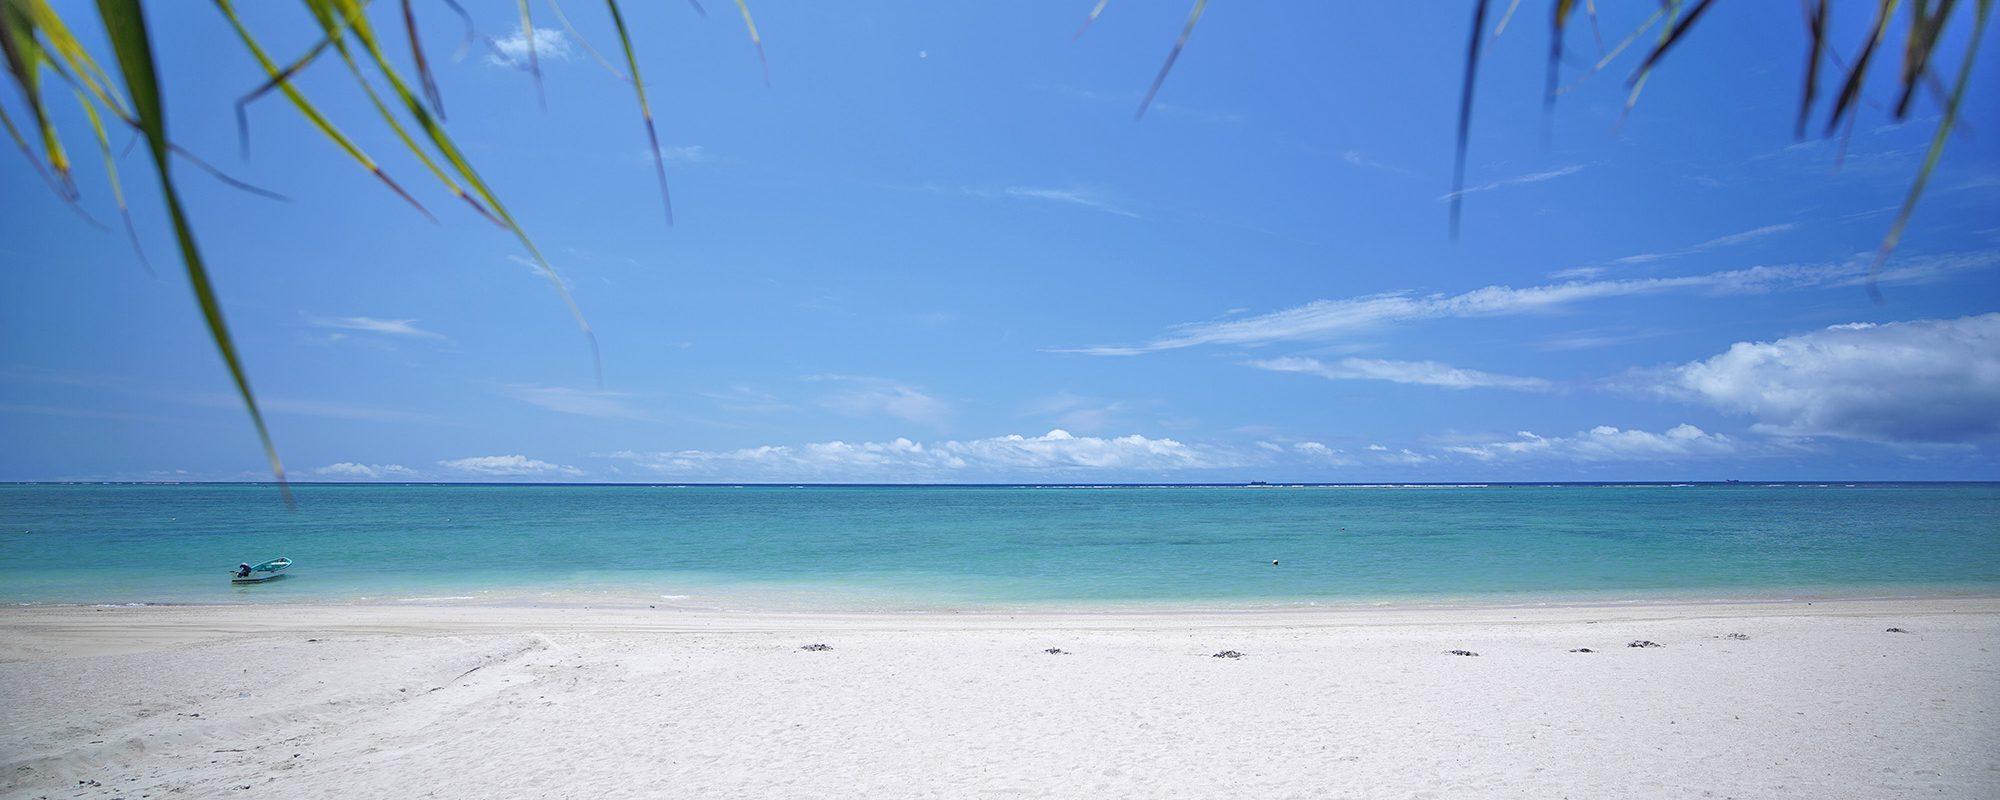 沖縄絶景写真海の風景